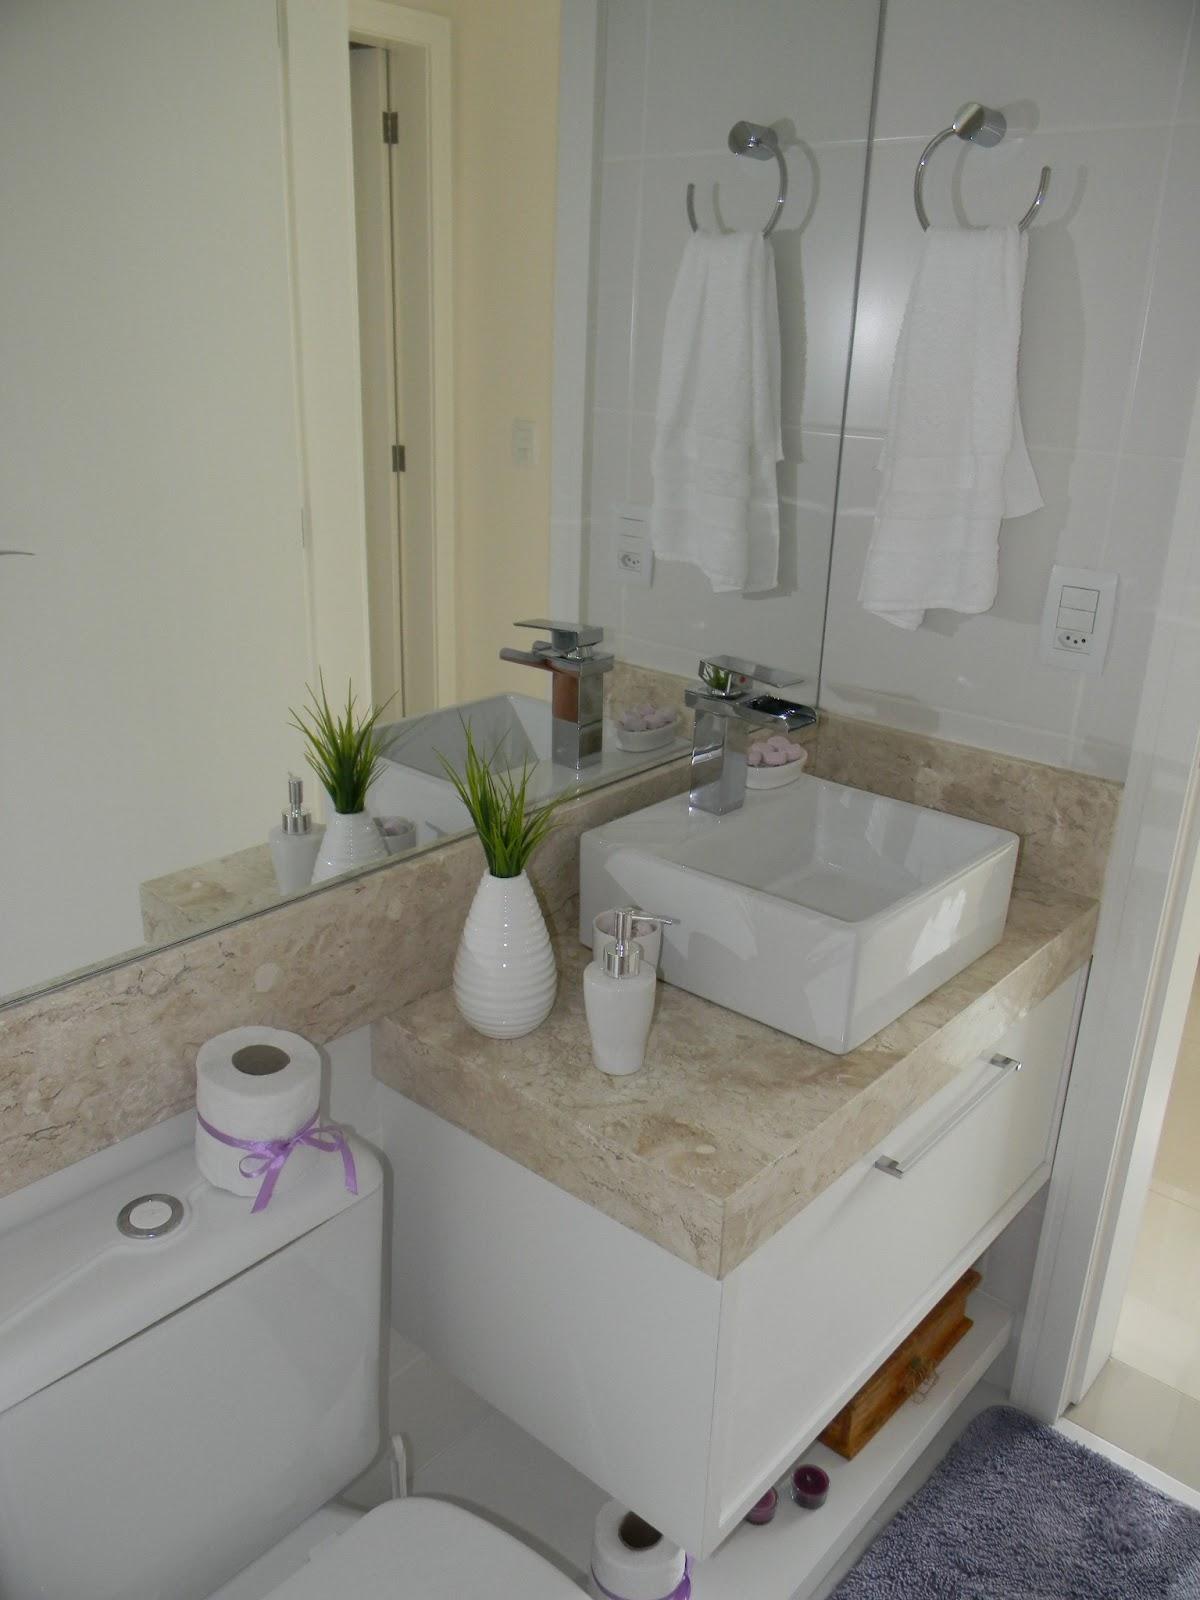 decoracao simples para ambientes pequenos:Adorei o estilo este banheiro! Romantico e funcional!